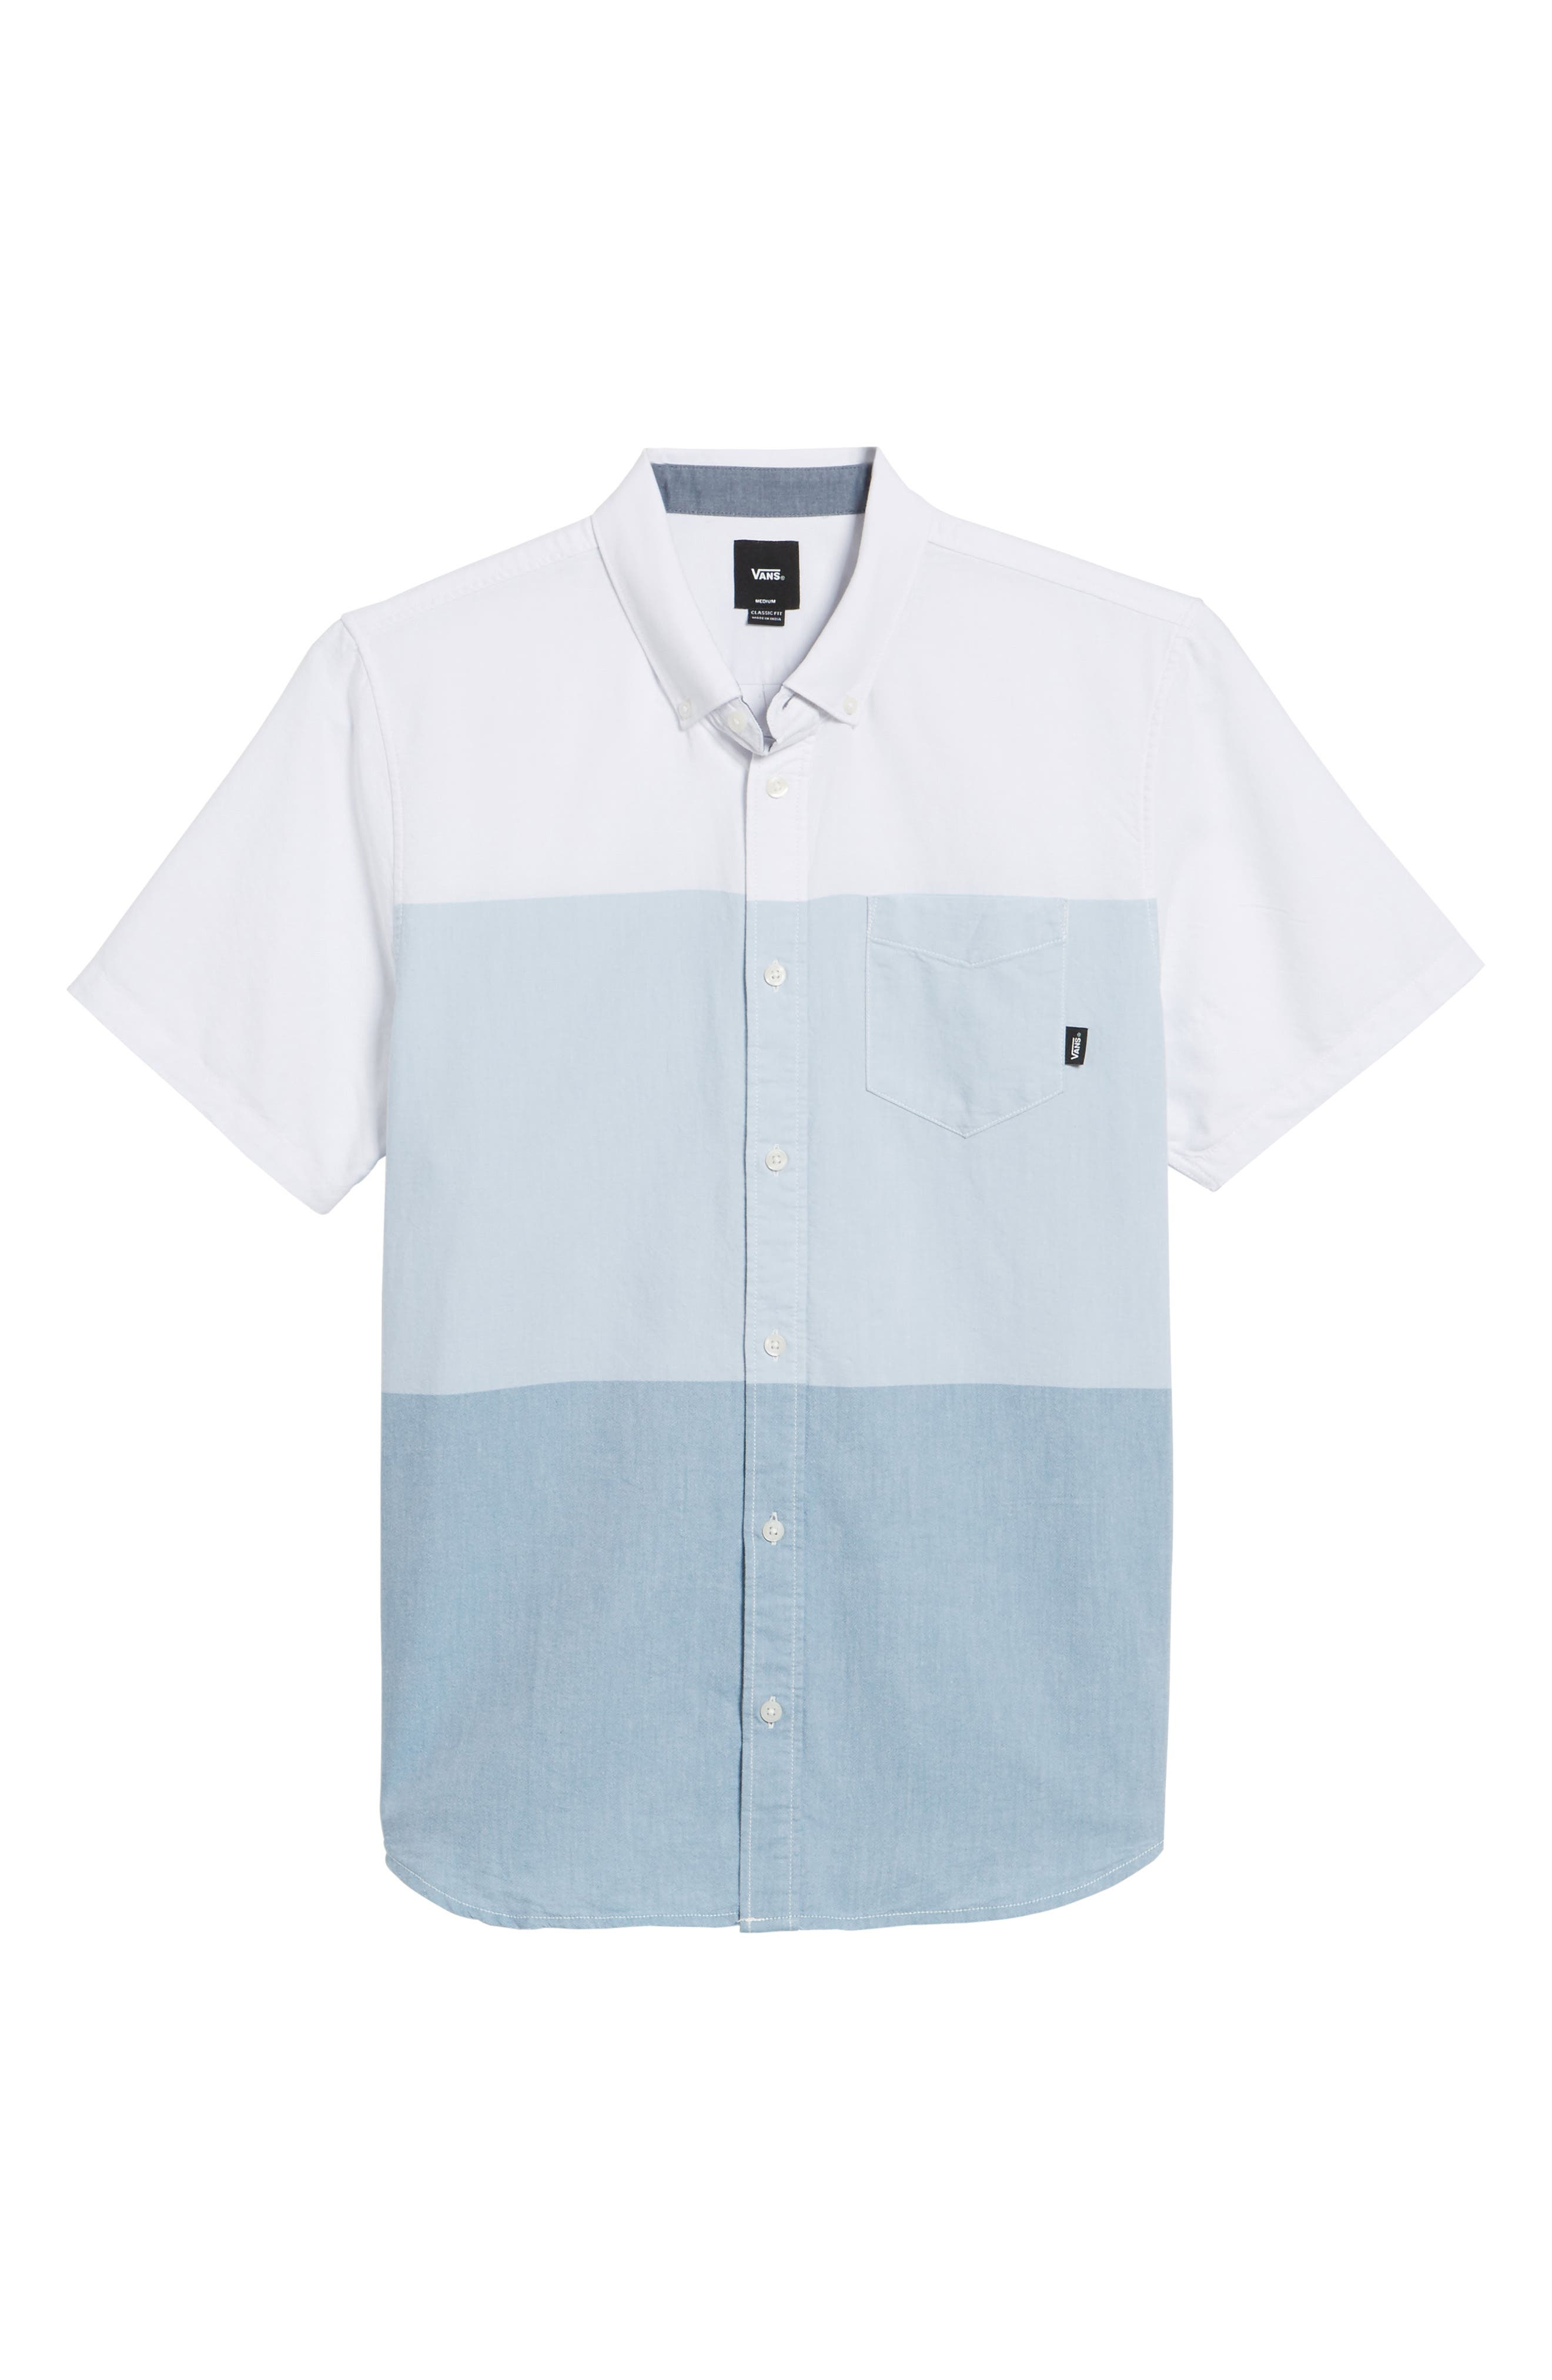 Houser Woven Shirt,                             Alternate thumbnail 6, color,                             White/ Real Teal